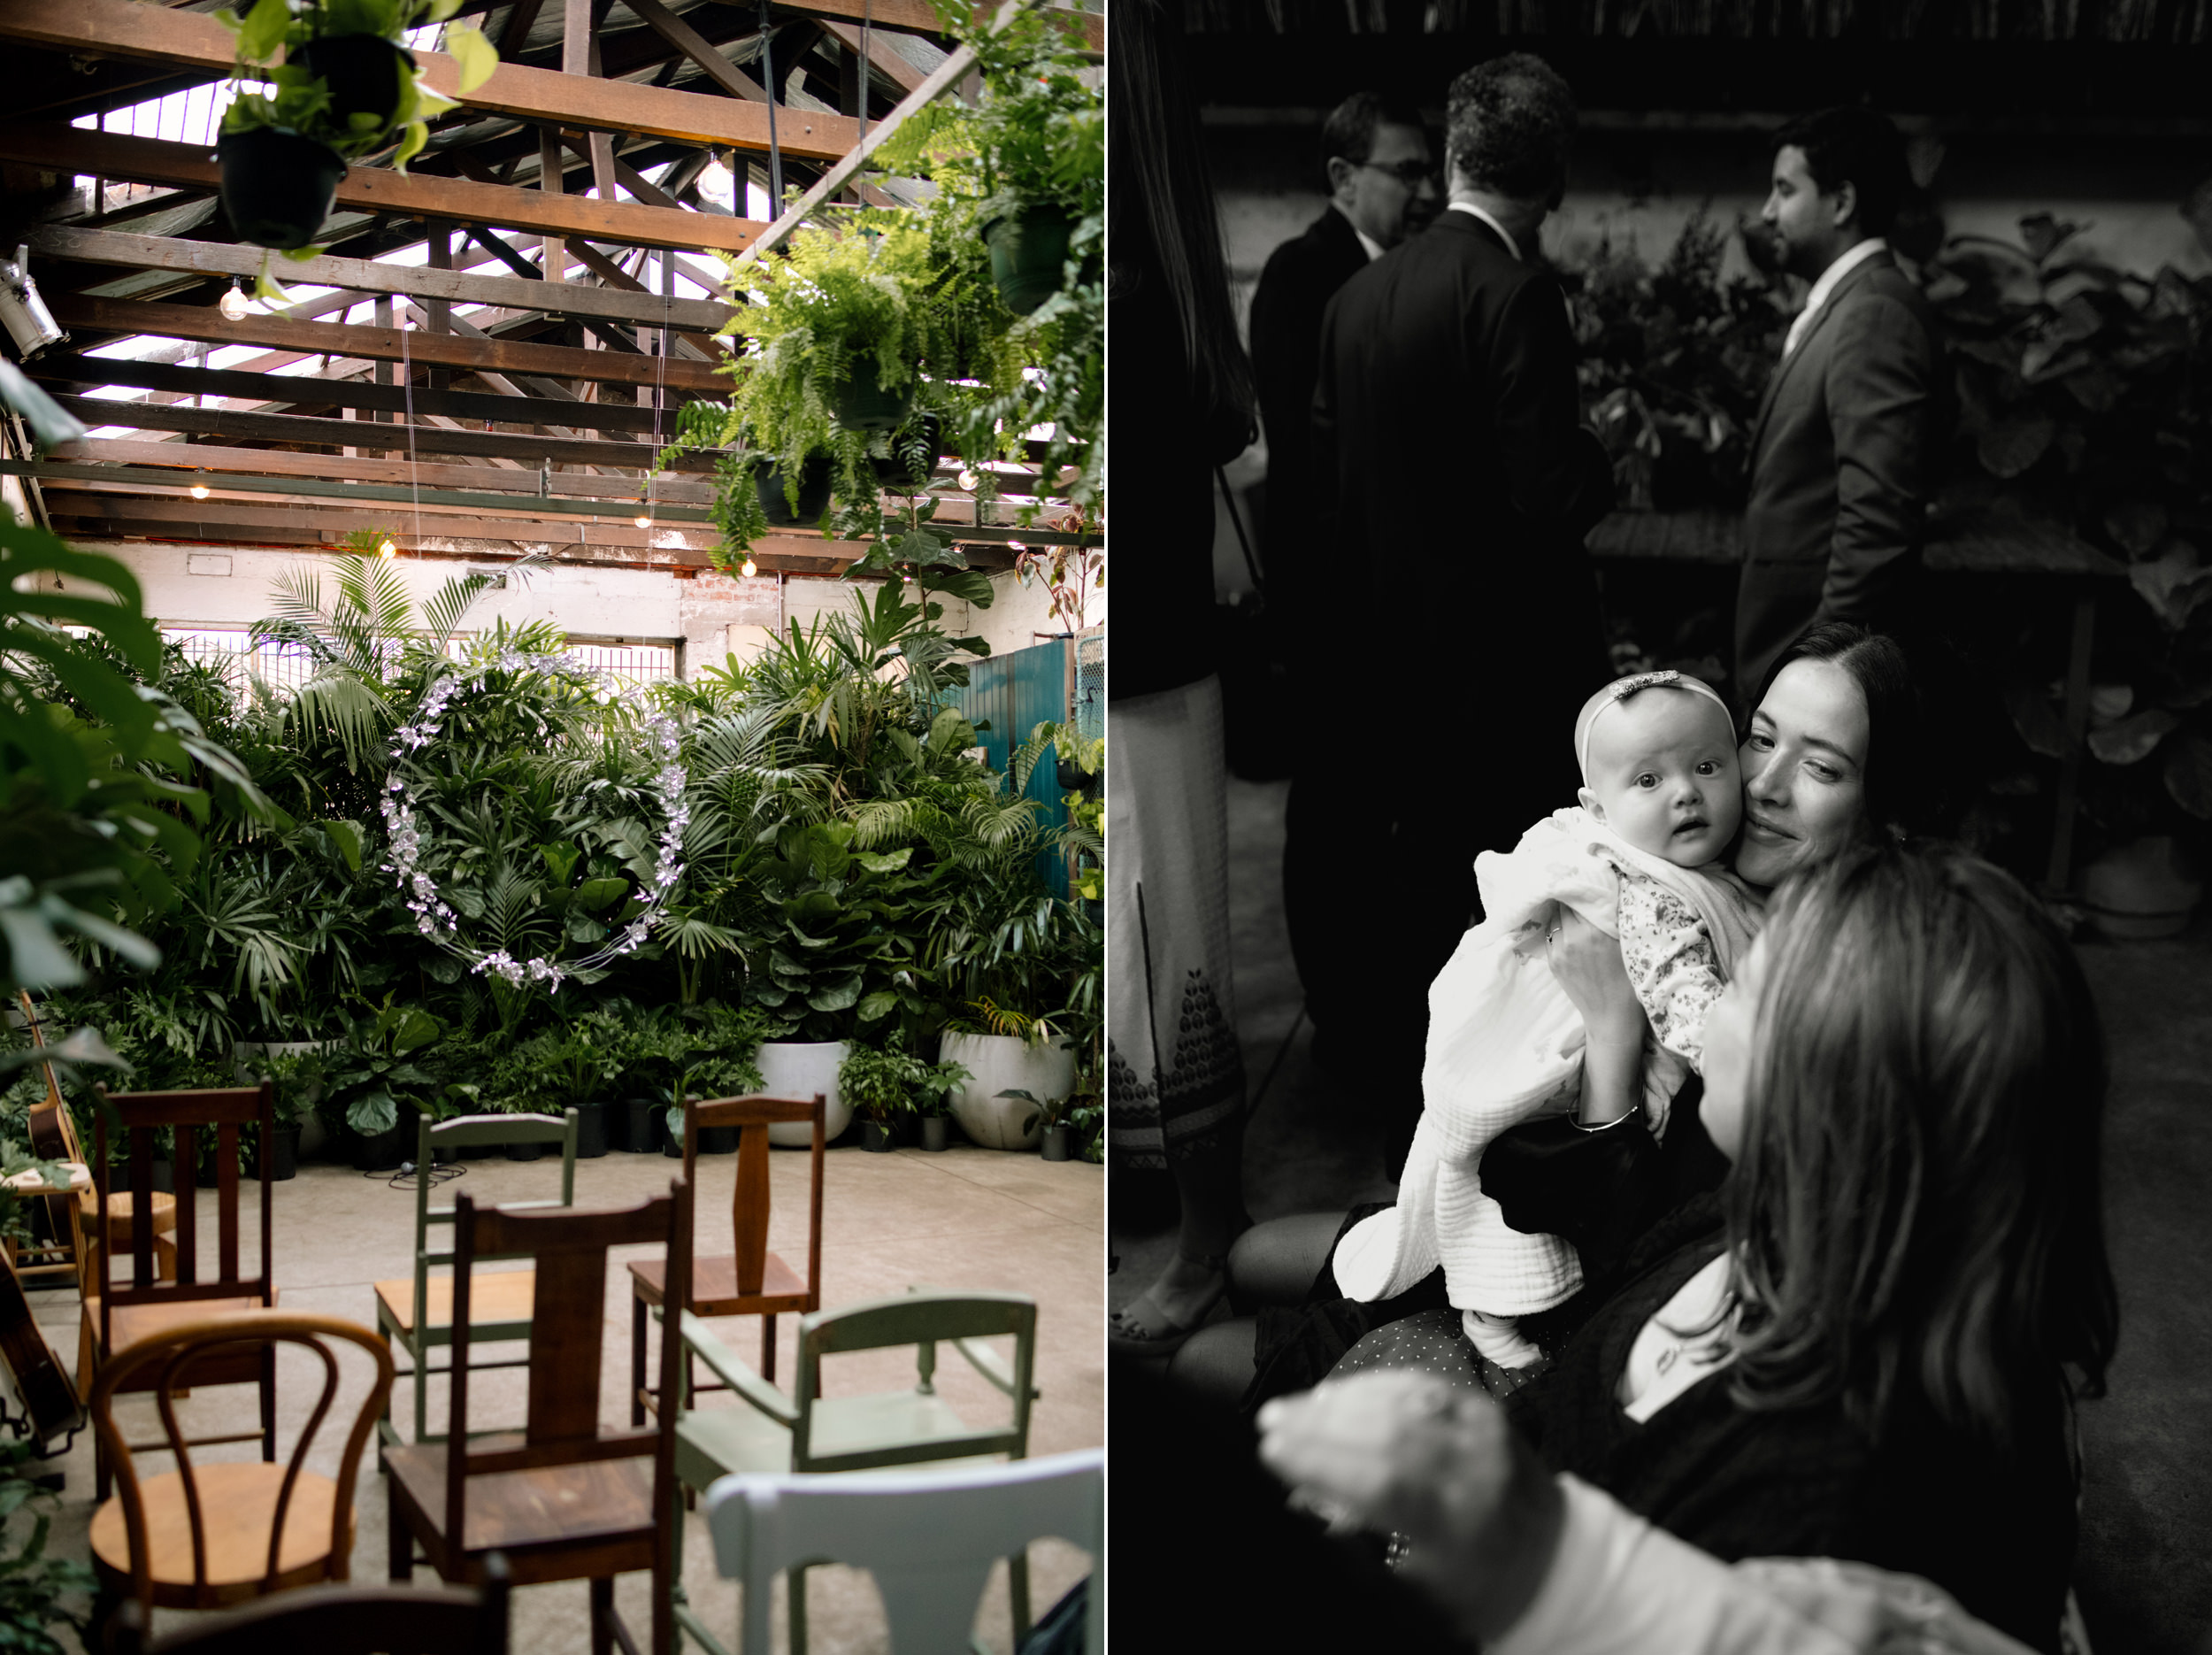 I-Got-You-Babe-&.Co.-Glasshaus-Wedding-Charlotte-Cameron0048.JPG